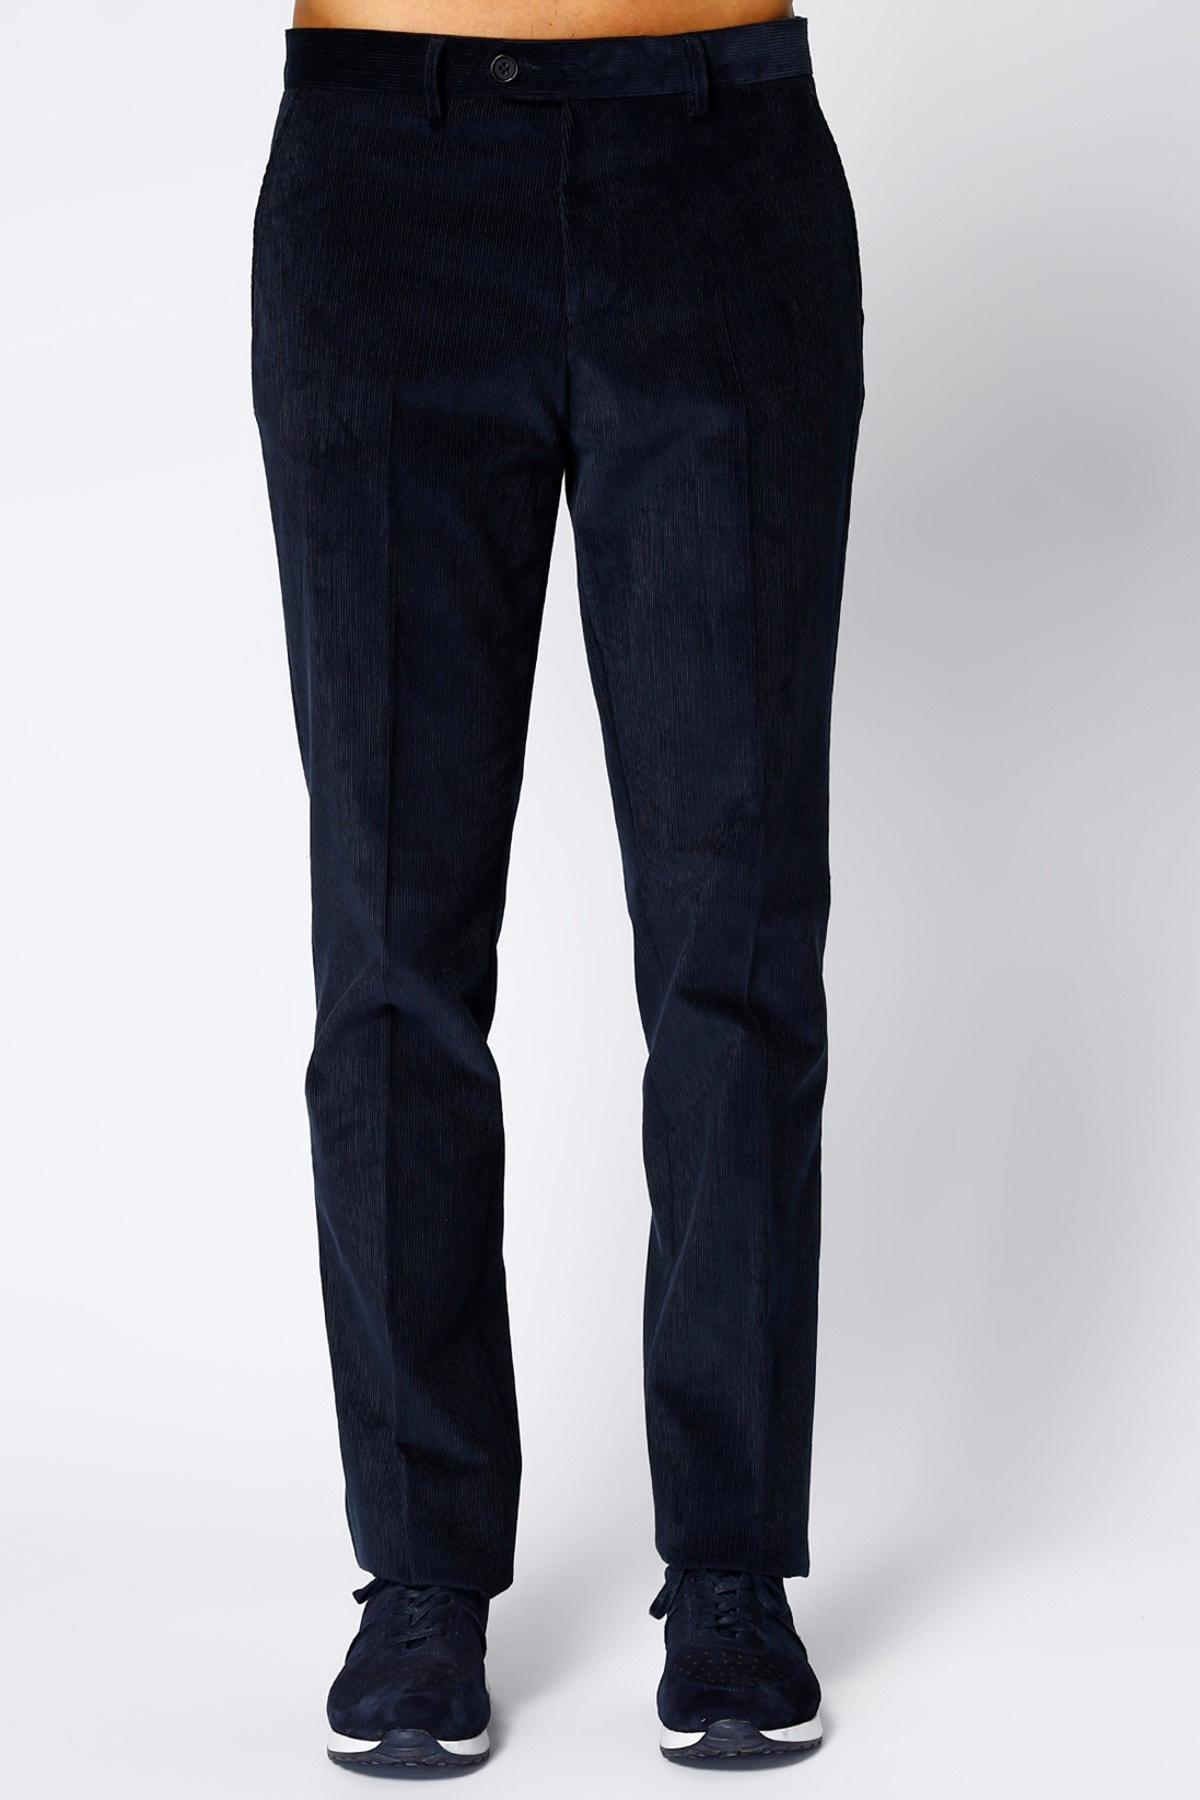 Cotton Bar Erkek Lacivert Pantolon 502953515 / Boyner 1